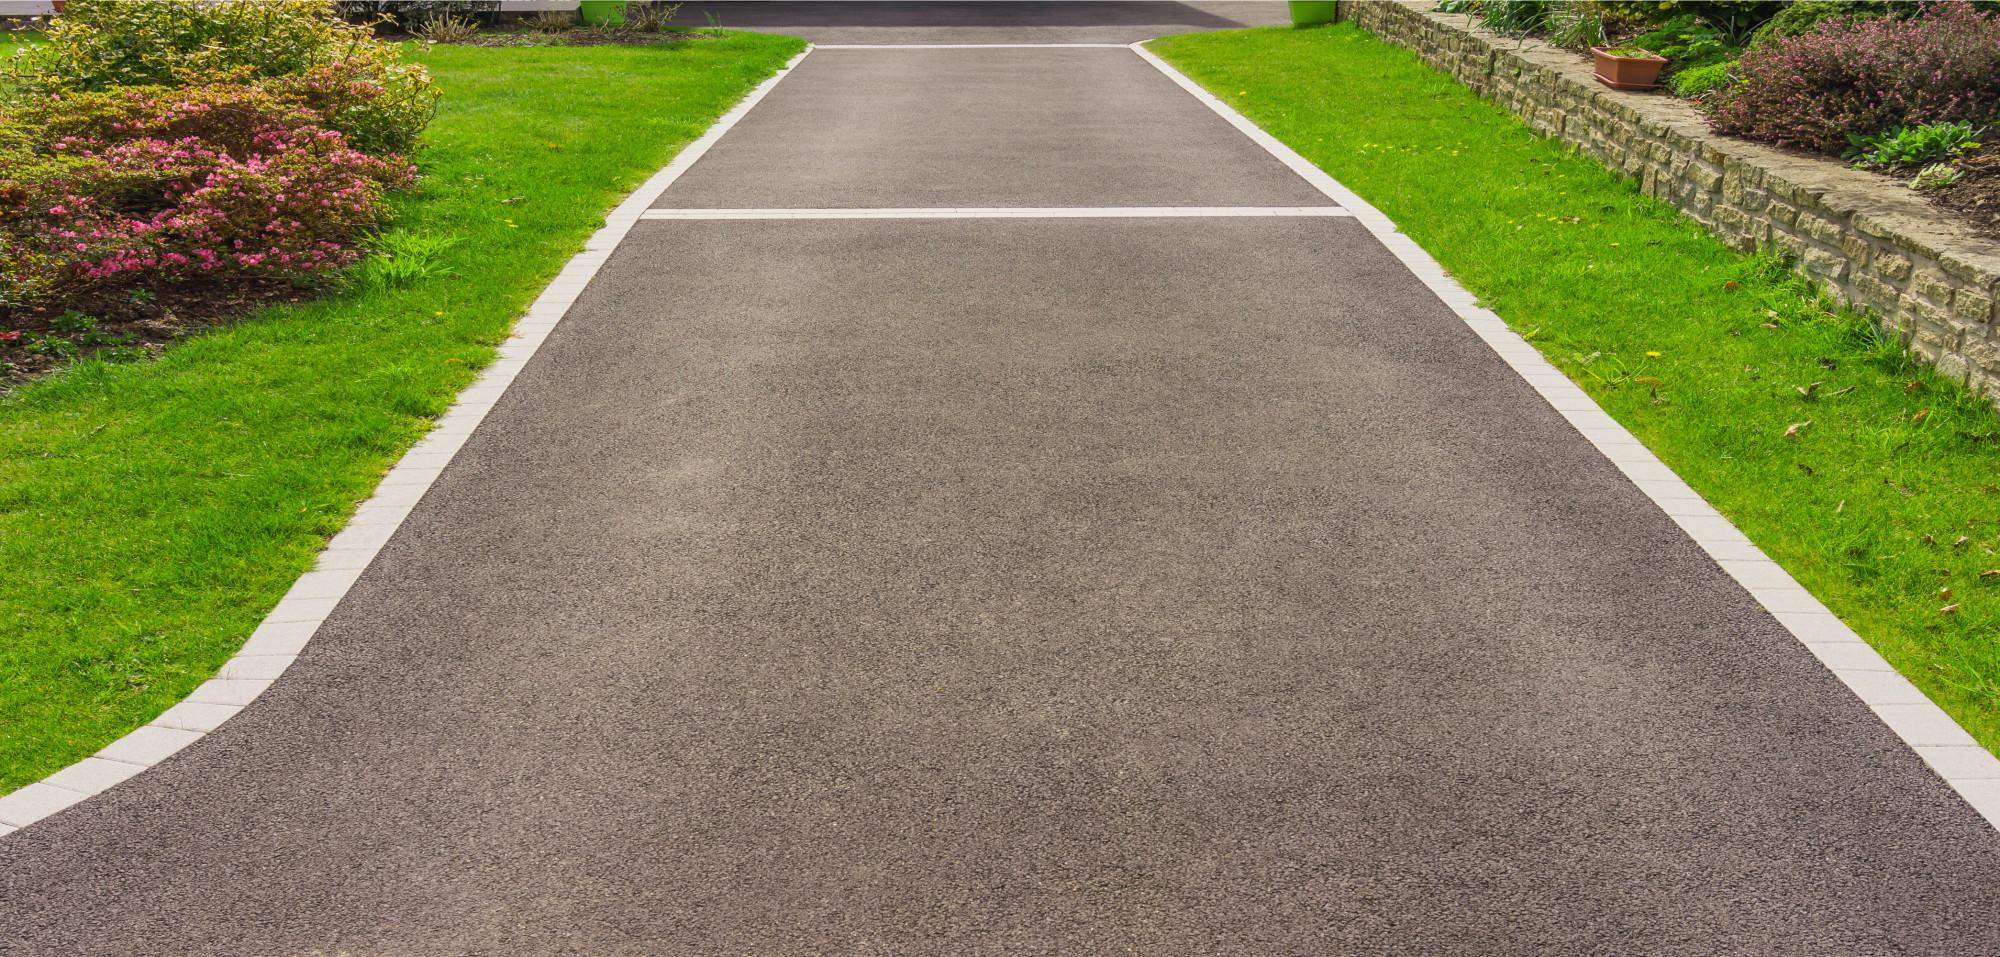 Installing asphalt driveway